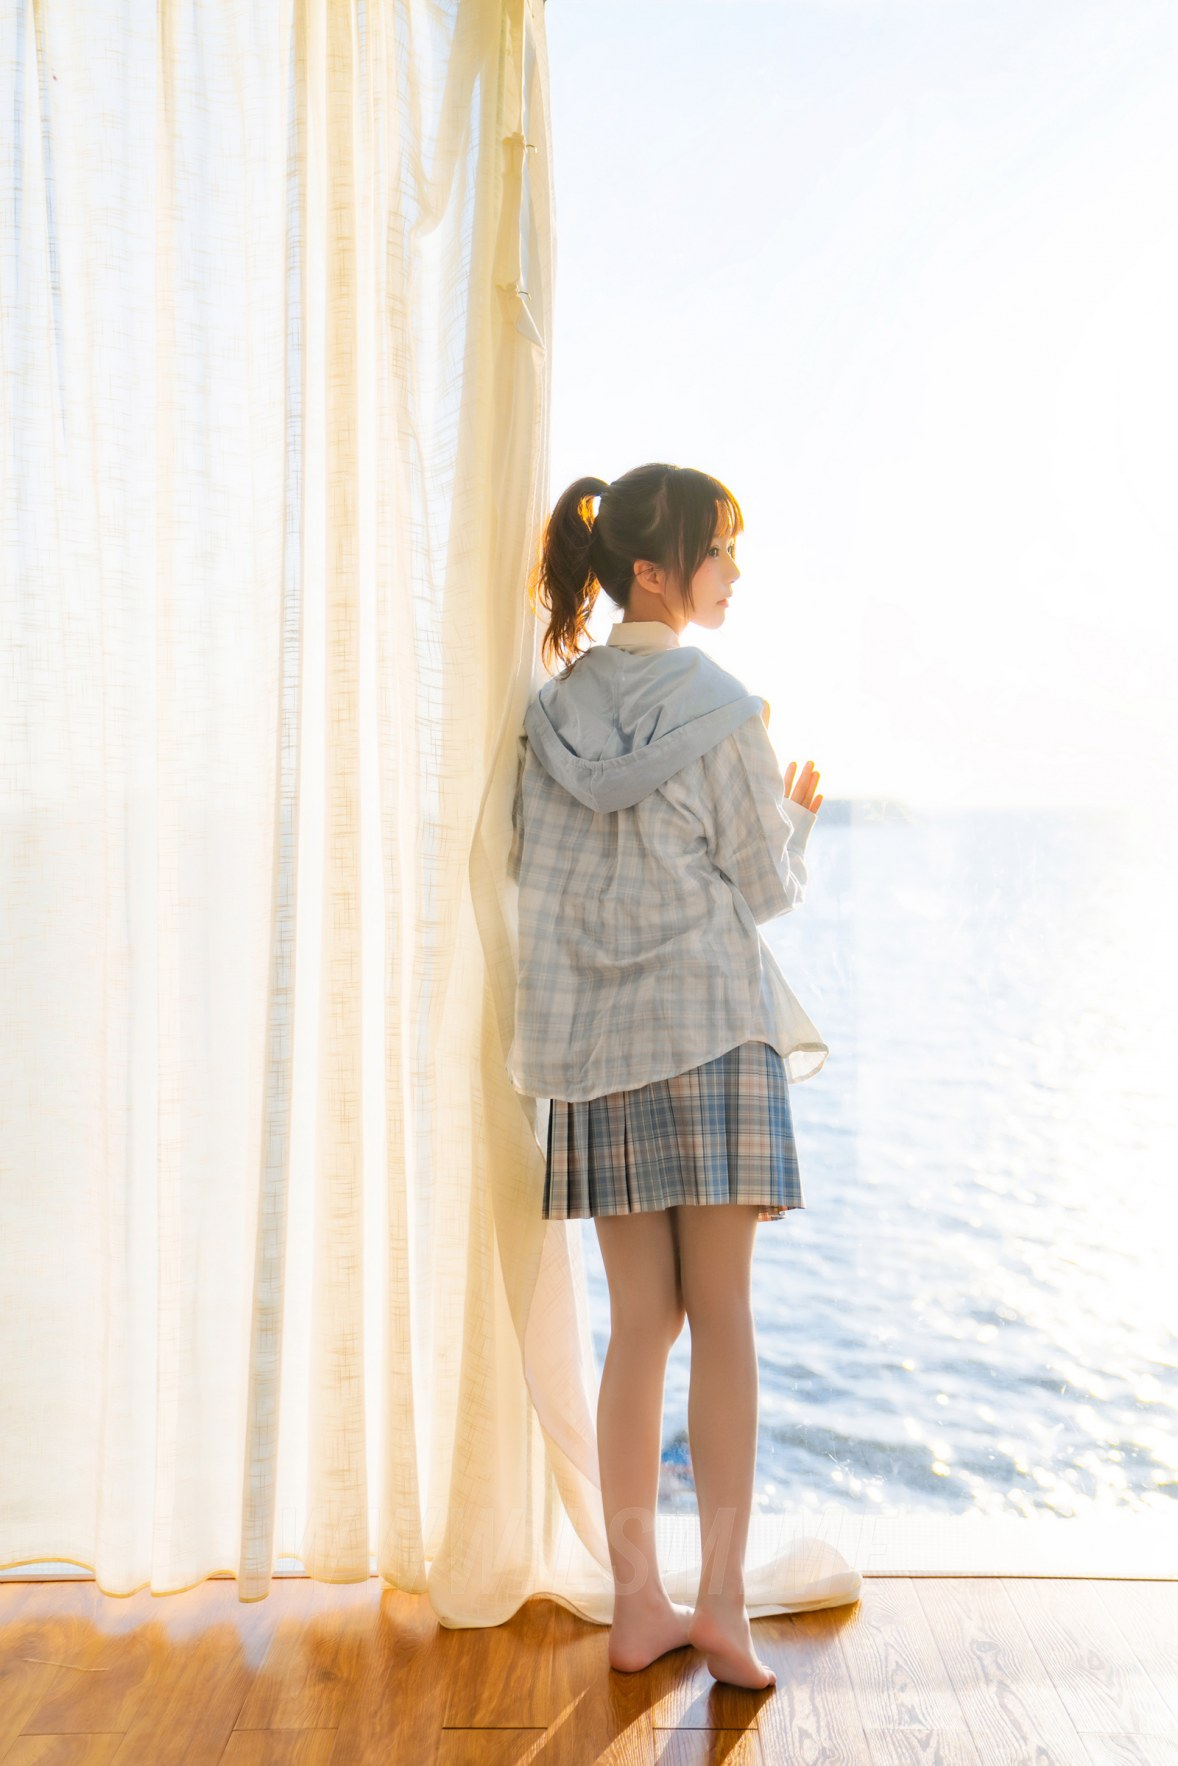 MTYH 喵糖映画 Vol.241 窗边的海 清纯学妹 - 4